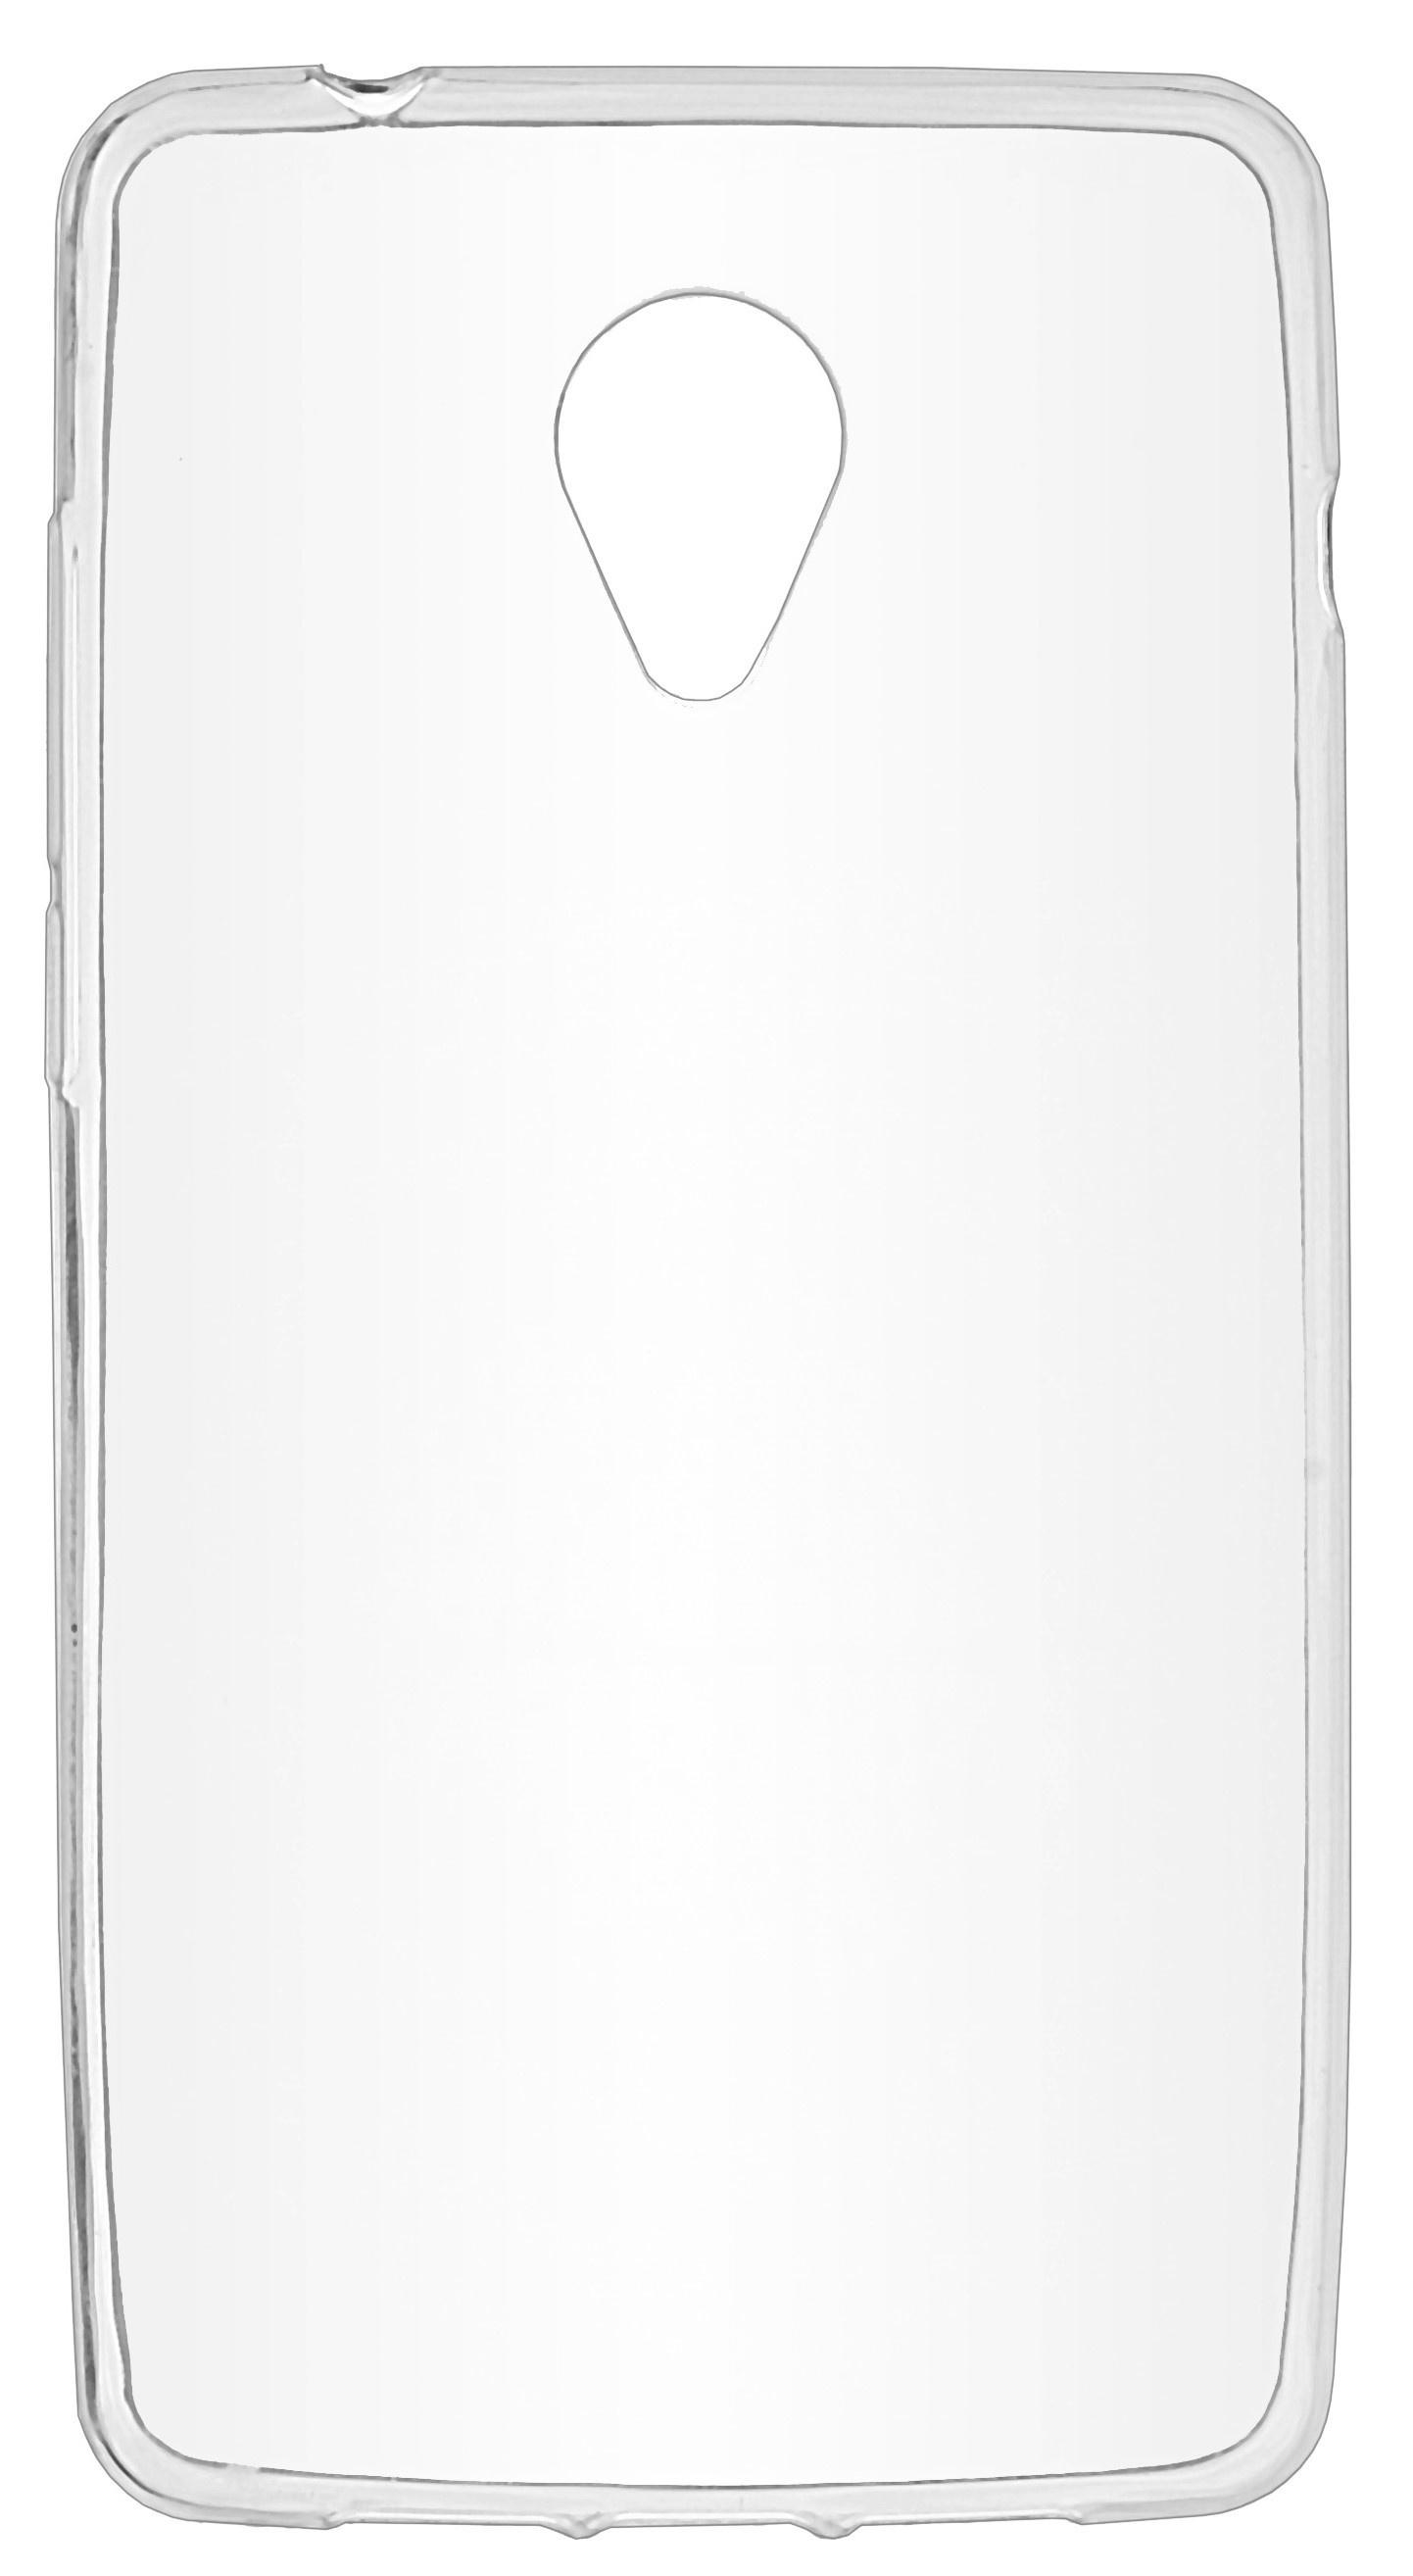 Чехол для сотового телефона skinBOX Slim Silicone, 4630042529557, прозрачный цена и фото